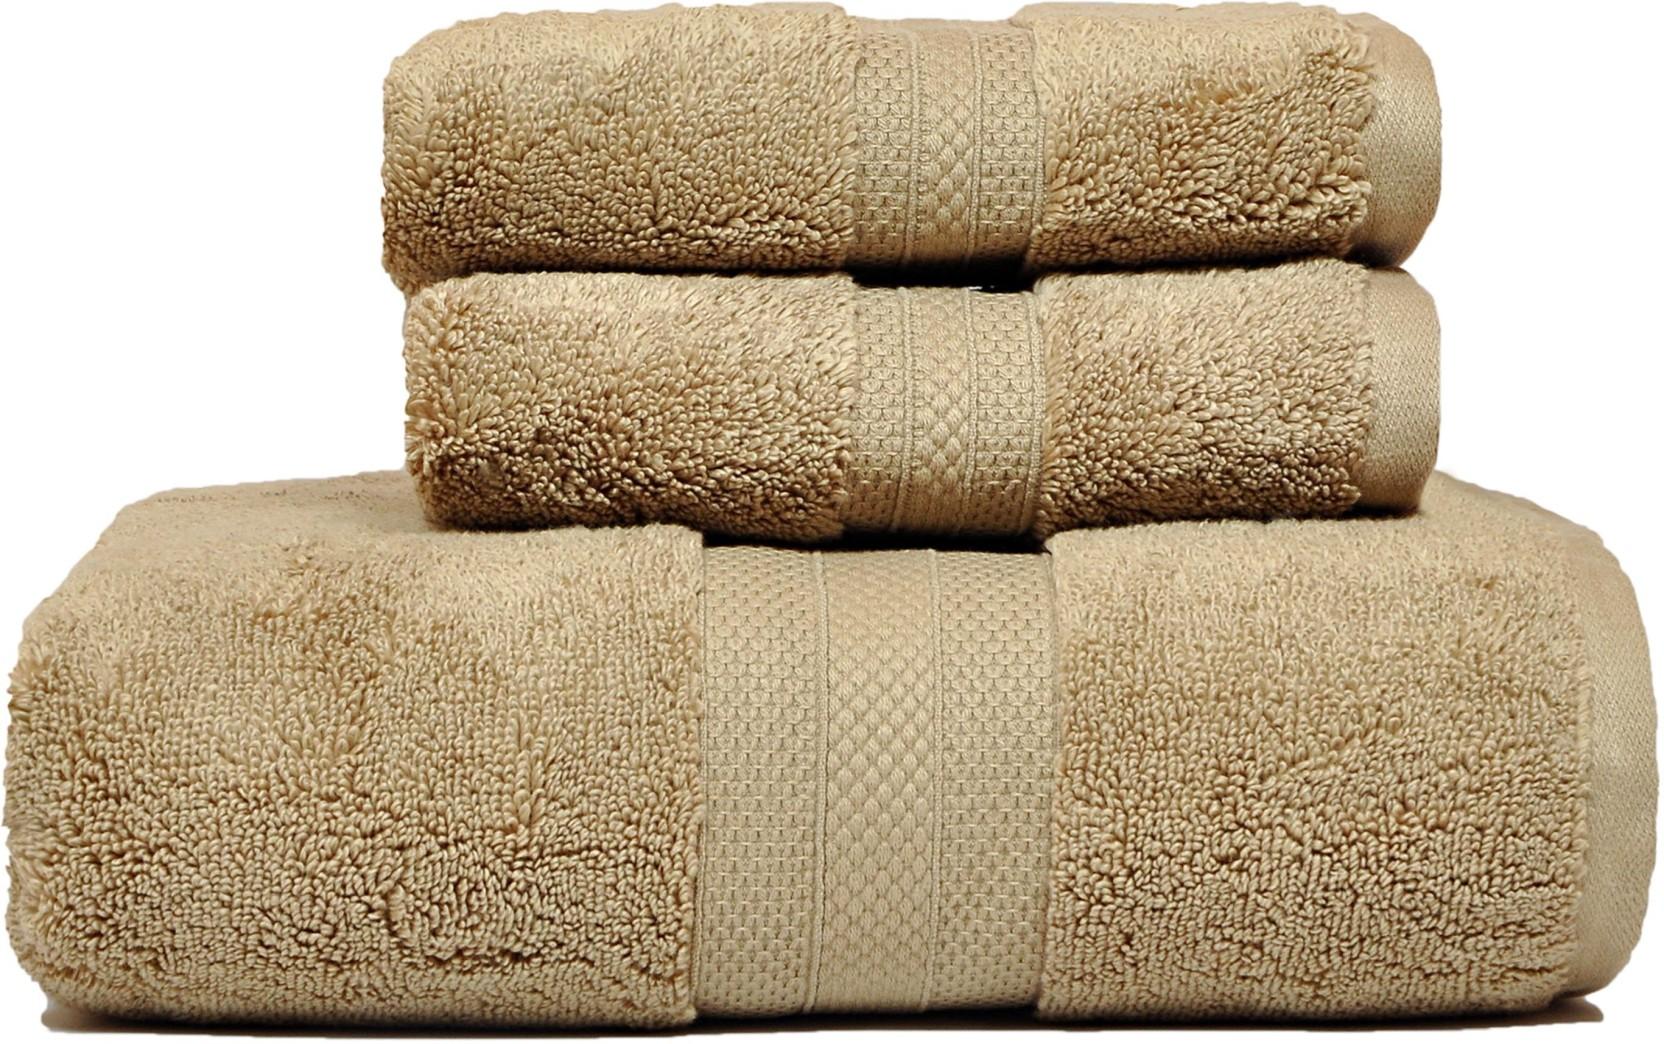 Casa Lino Cotton 650 GSM Bath, Hand Towel Set - Buy Casa Lino Cotton ...